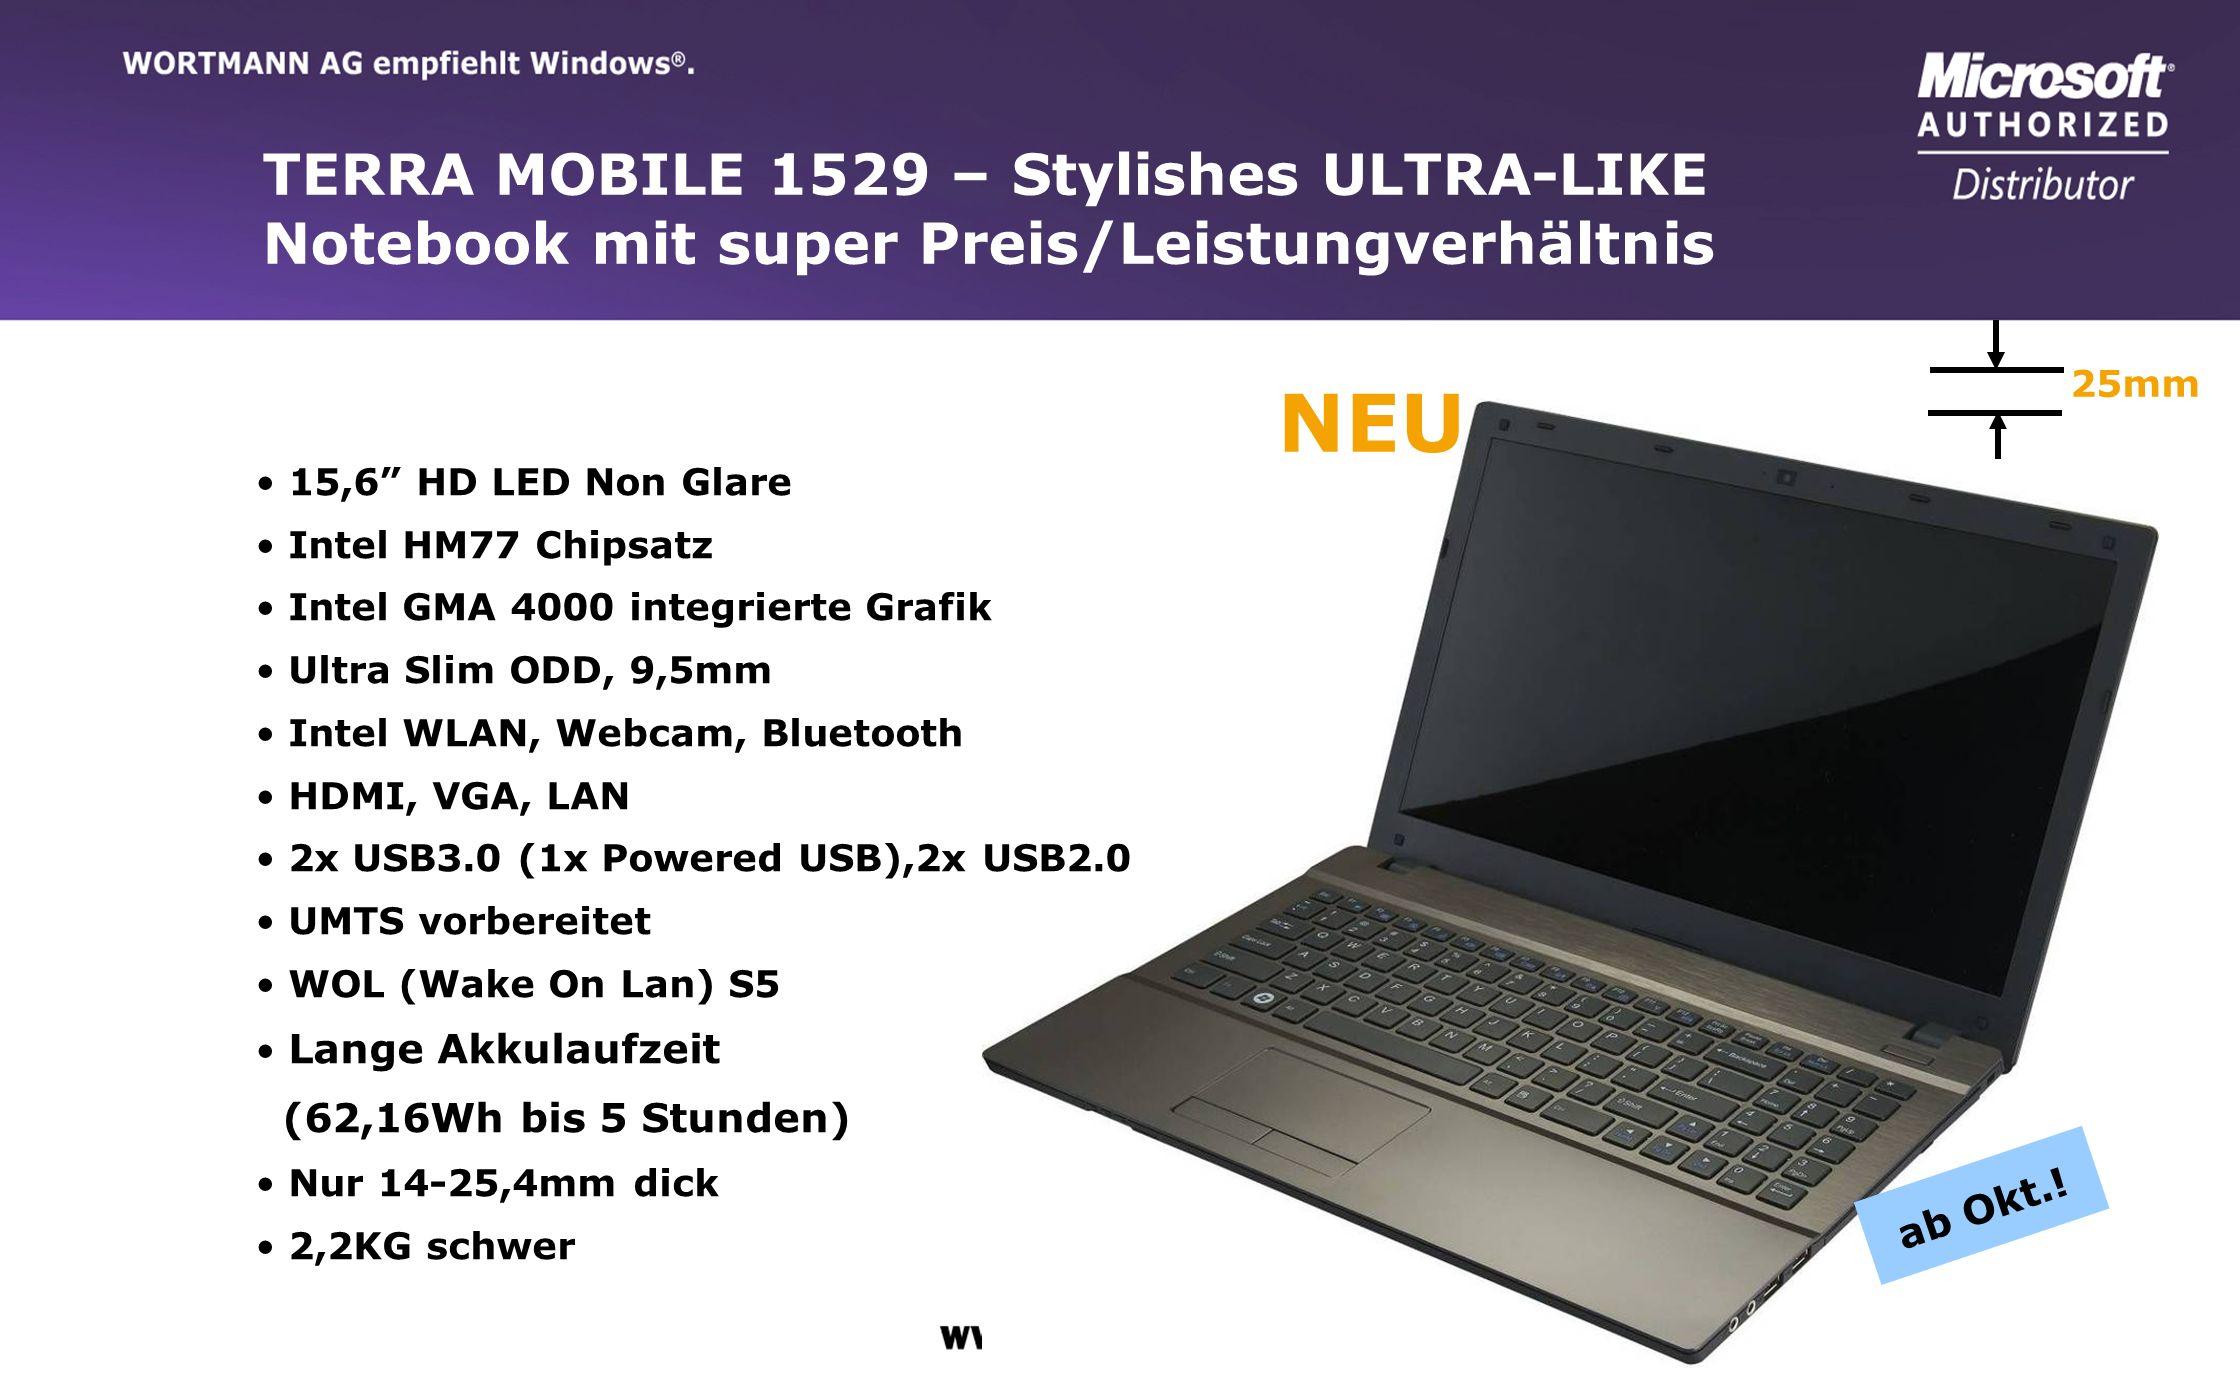 www.wortmann.de TERRA MOBILE 1529 – Stylishes ULTRA-LIKE Notebook mit super Preis/Leistungverhältnis 15,6 HD LED Non Glare Intel HM77 Chipsatz Intel G